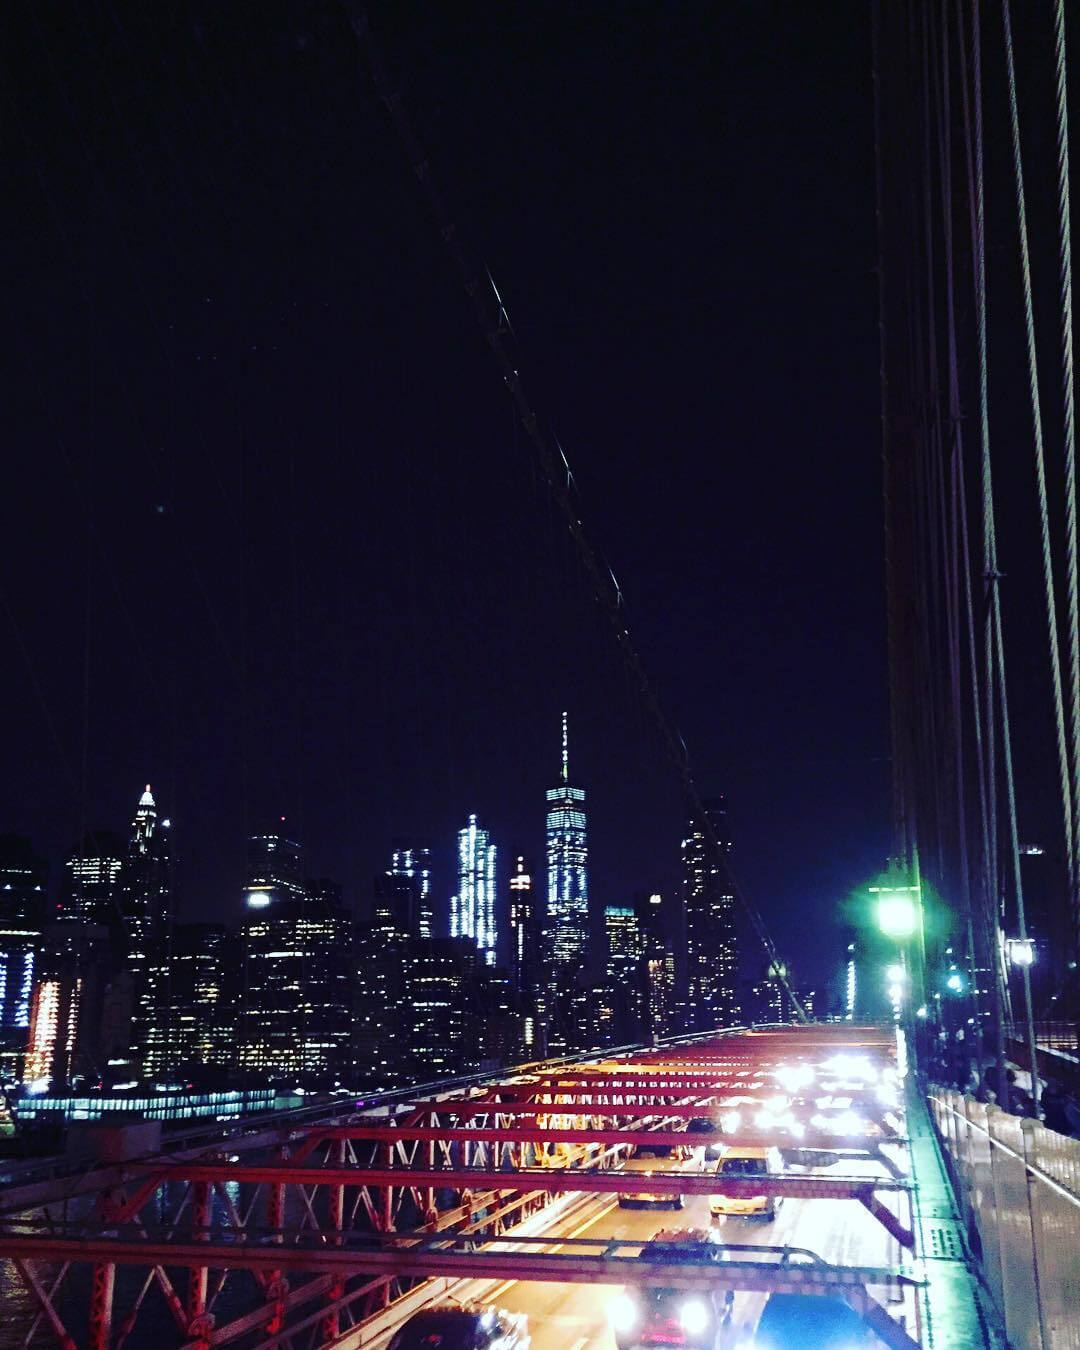 brooklyn-bridge-by-night-new-york